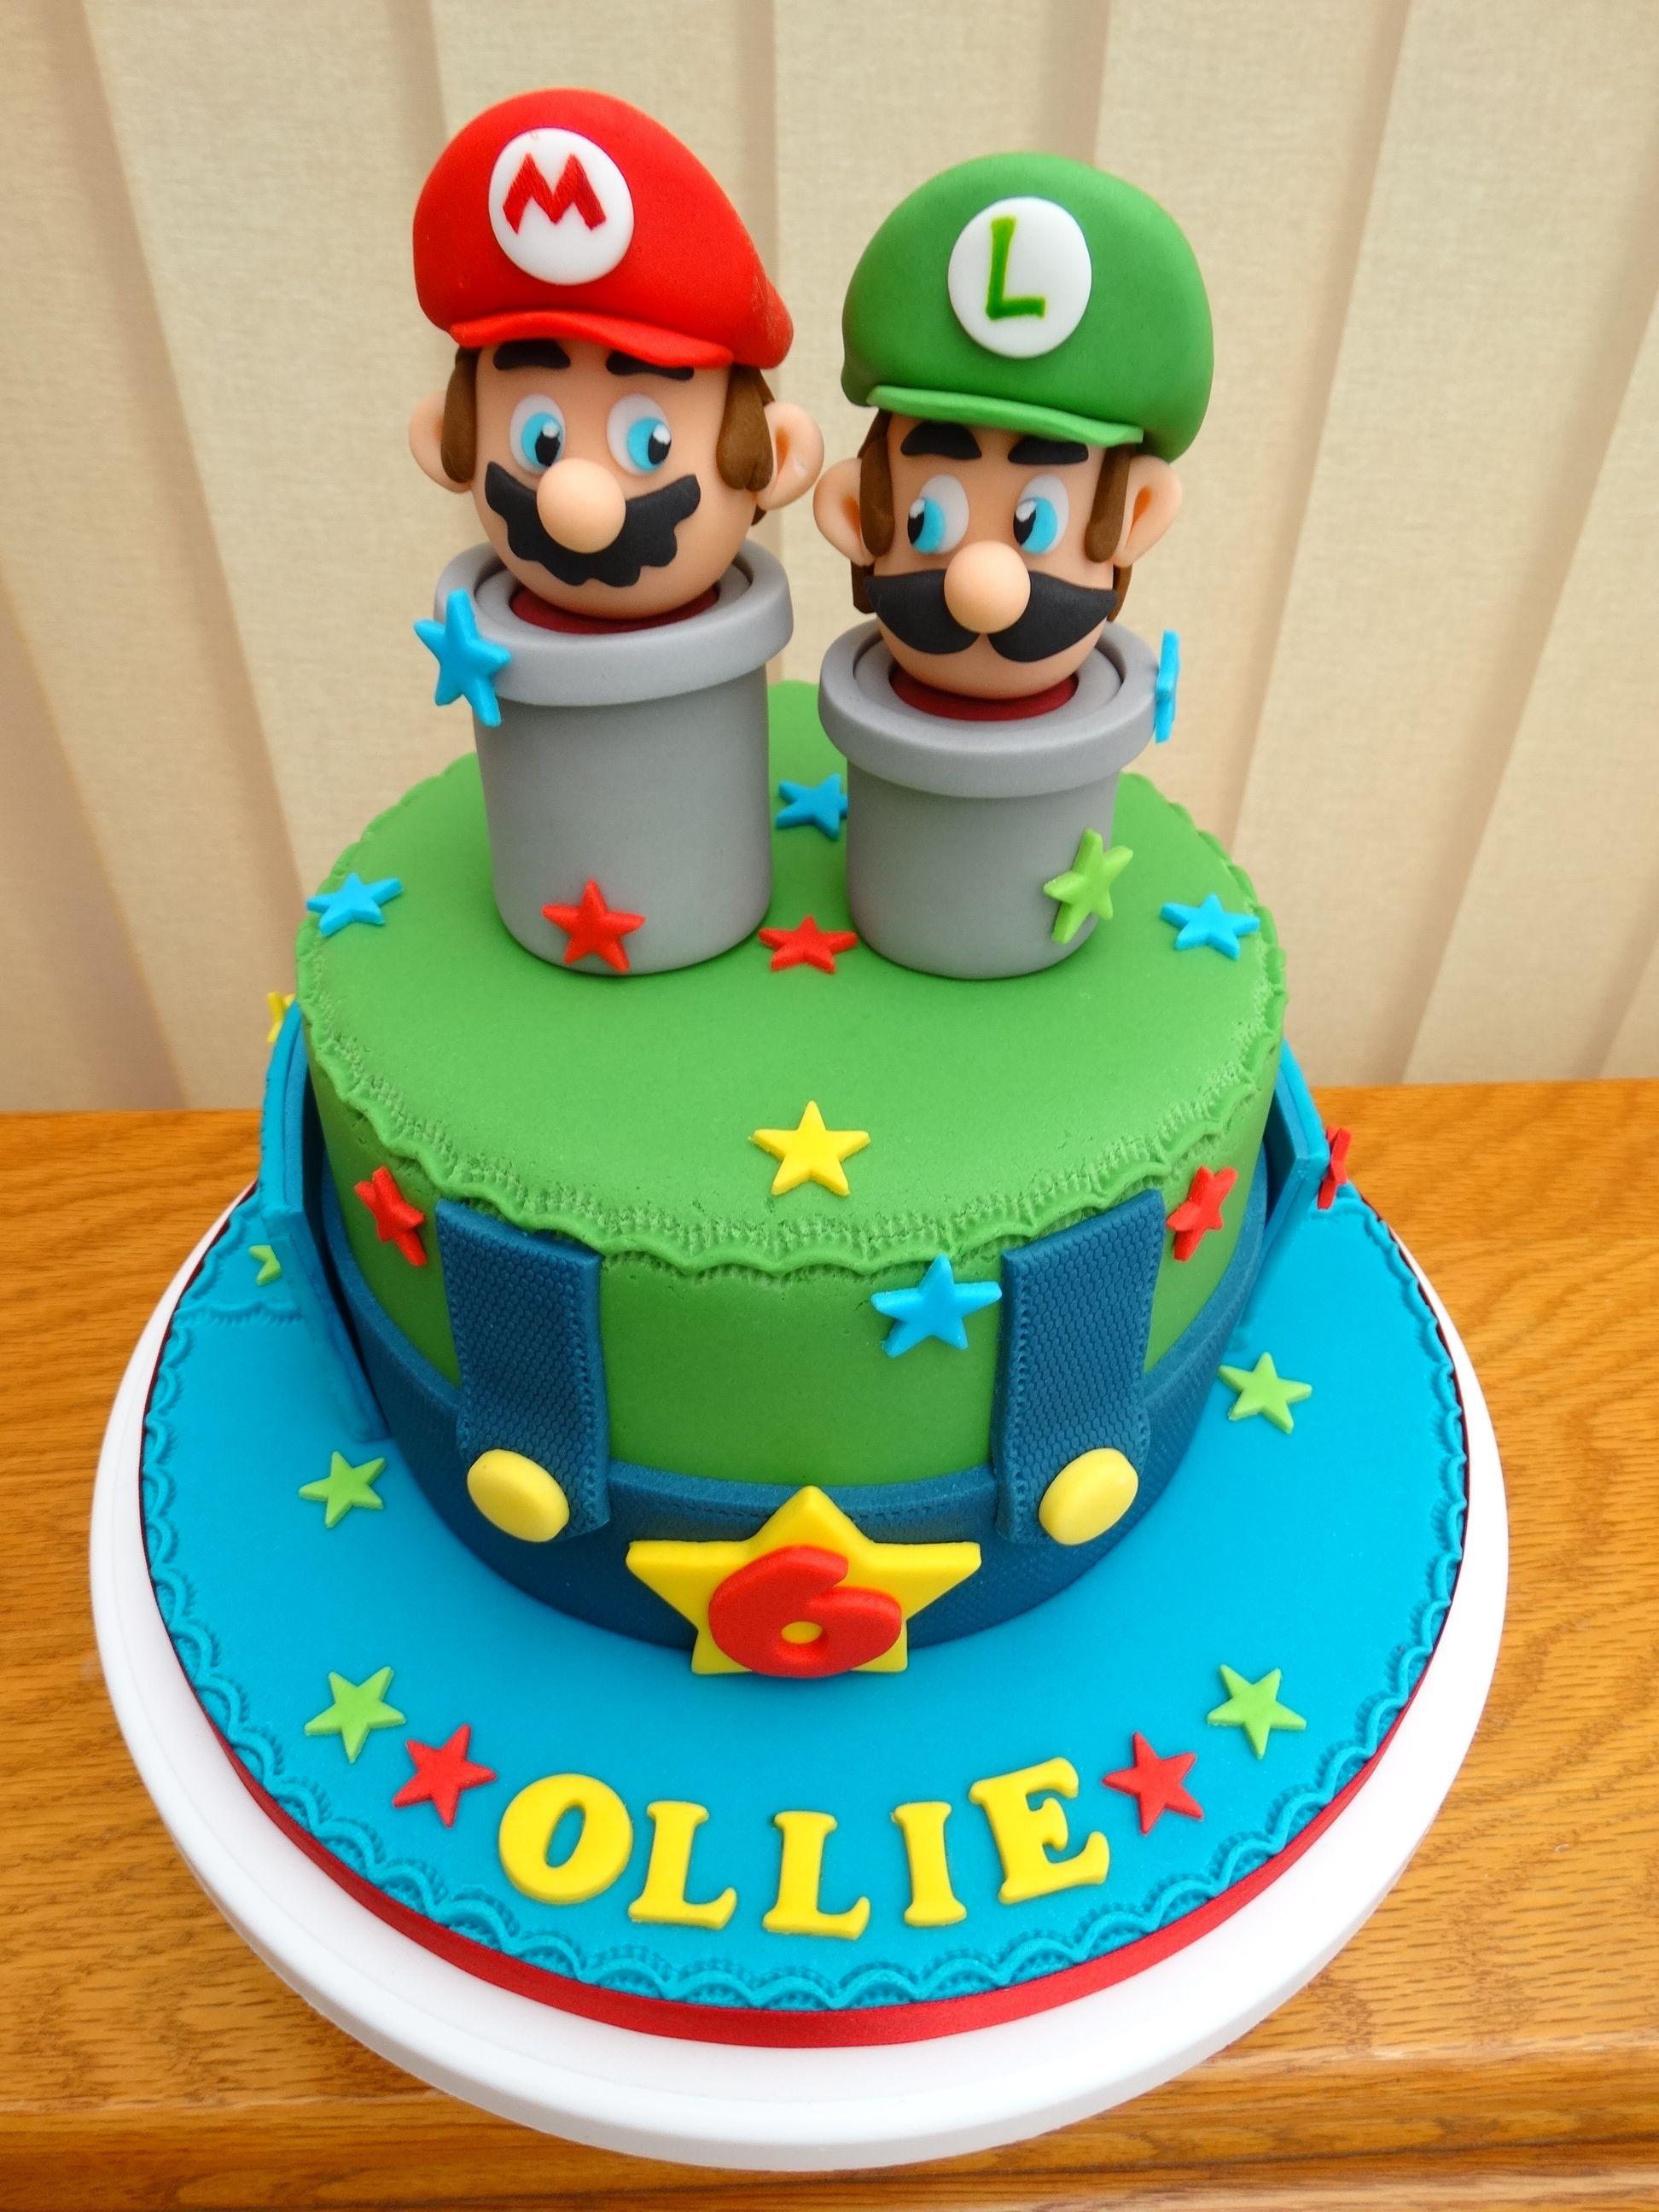 Astounding Super Mario Brothers Cake Xmcx Mario Luigi With Images Funny Birthday Cards Online Unhofree Goldxyz